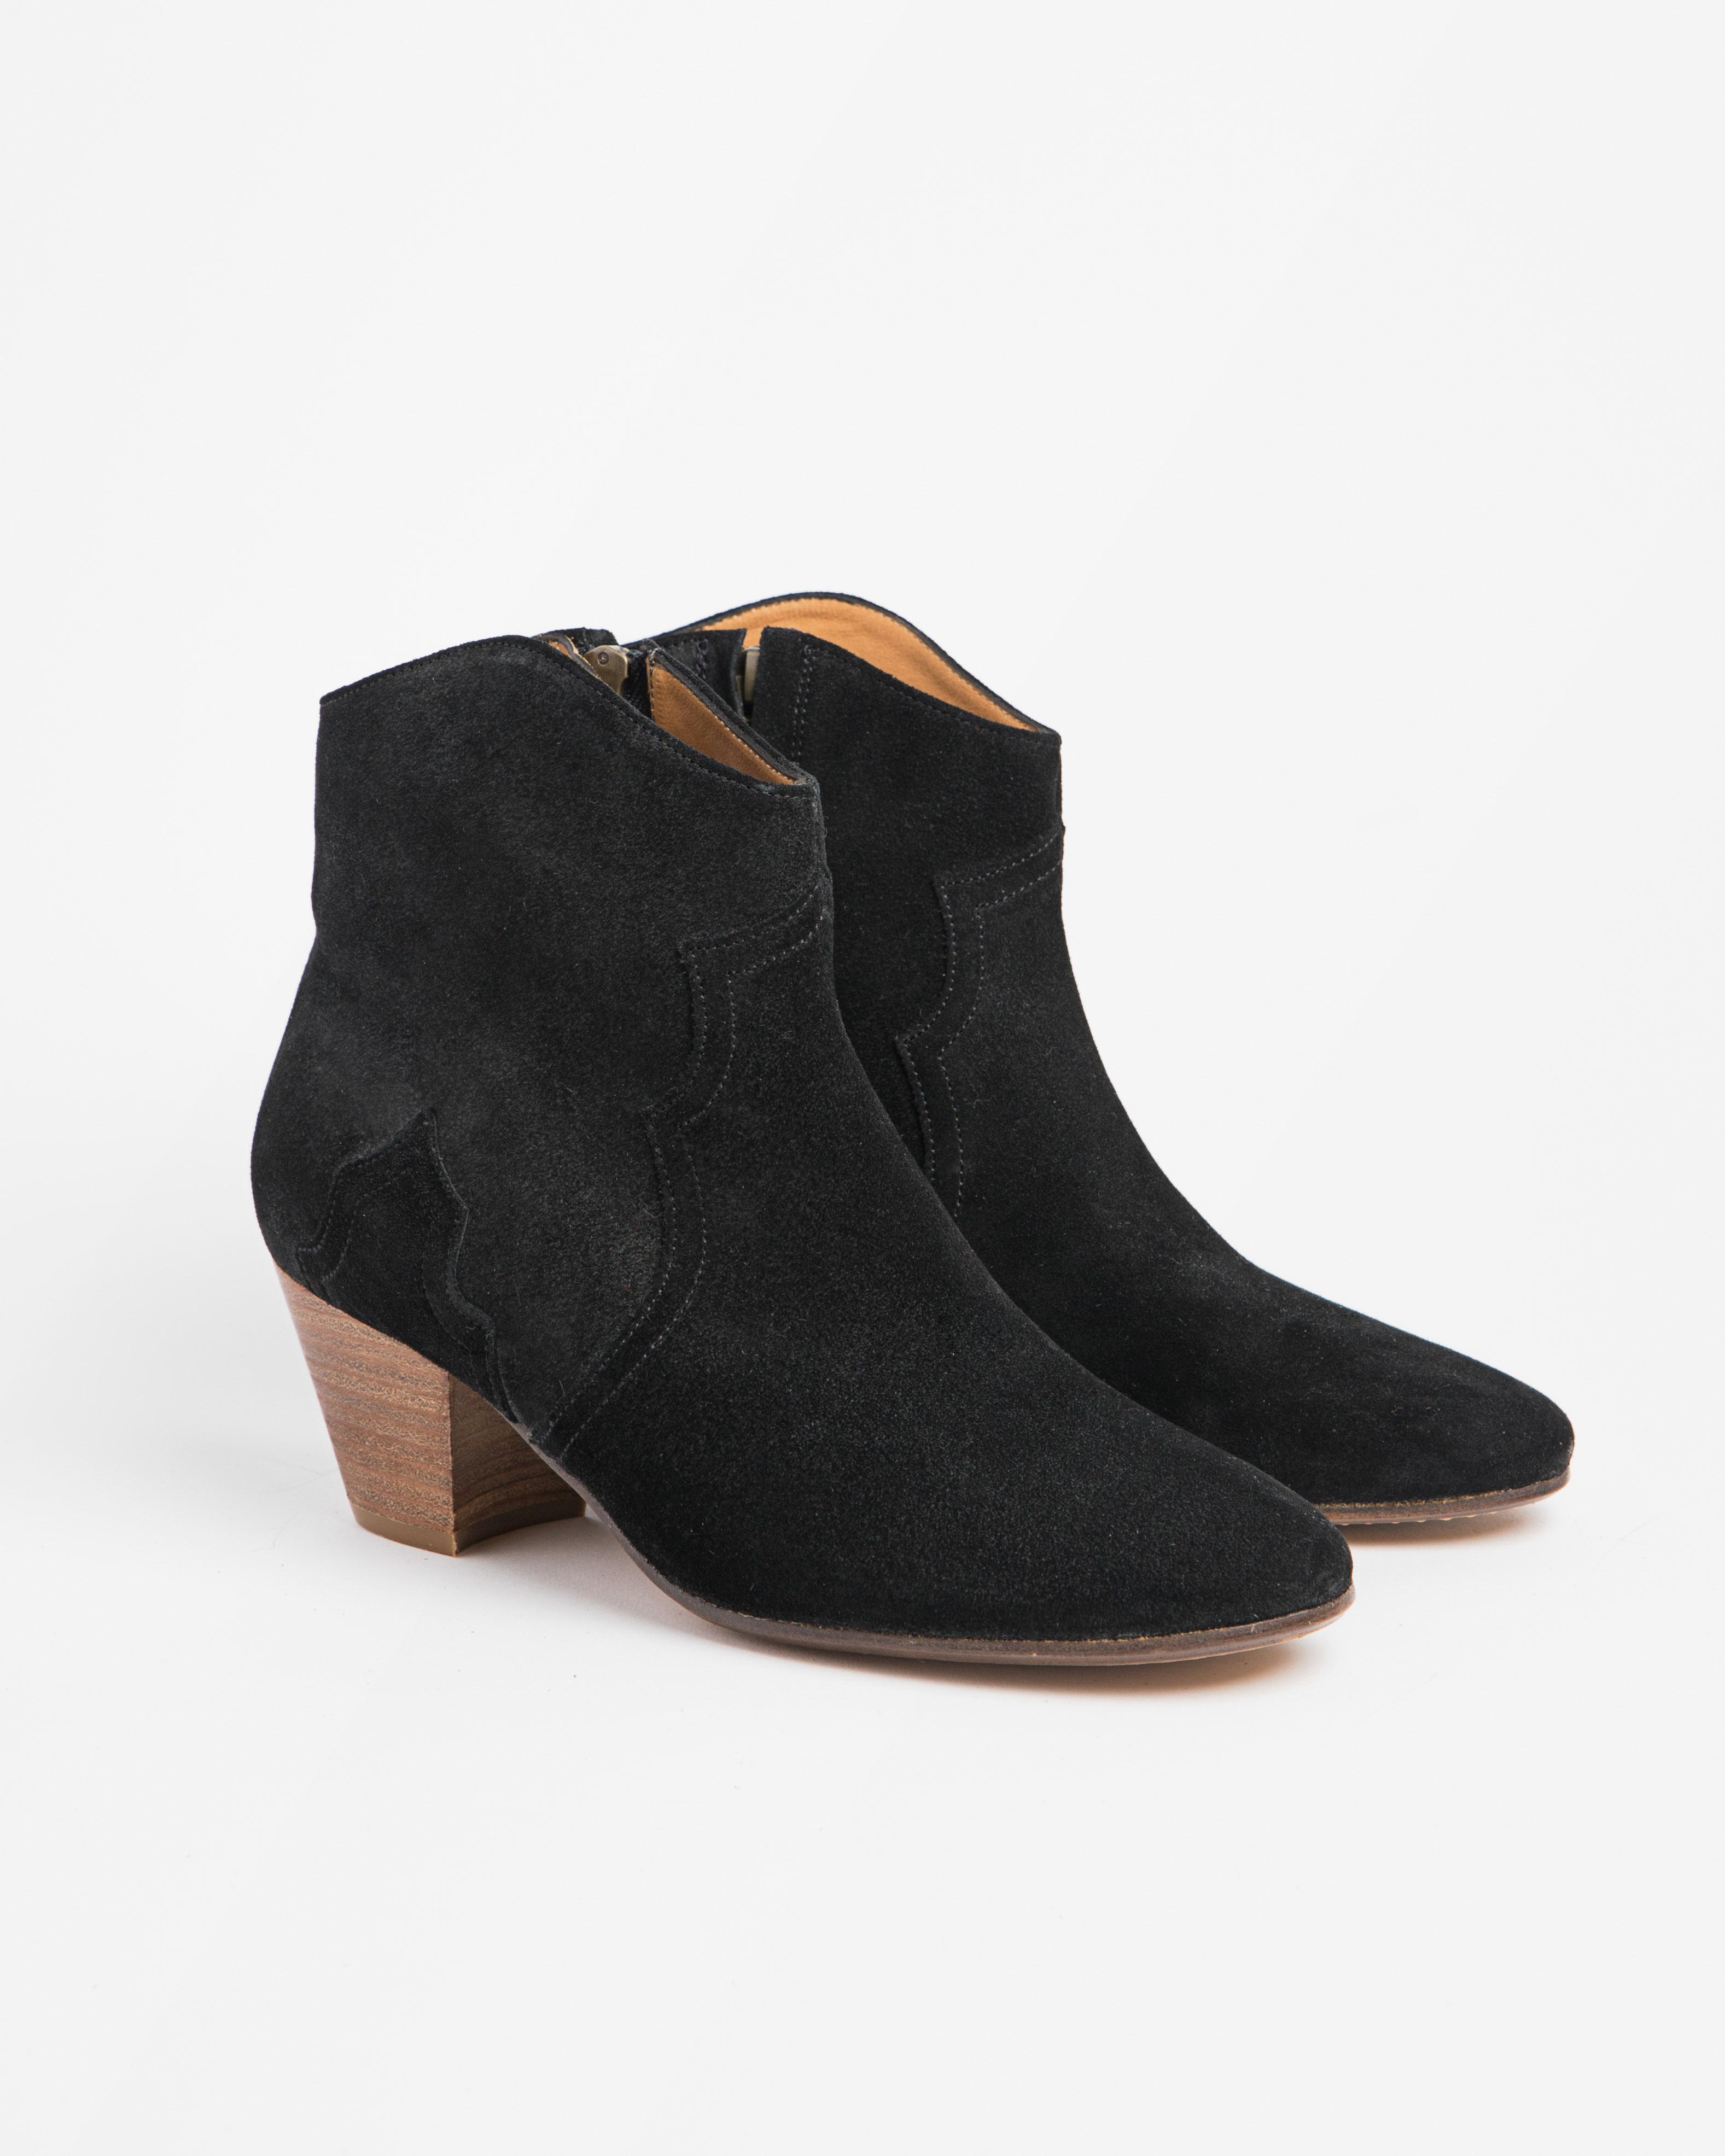 Isabel Marant Etoile 3 - Dicker Boot - Black